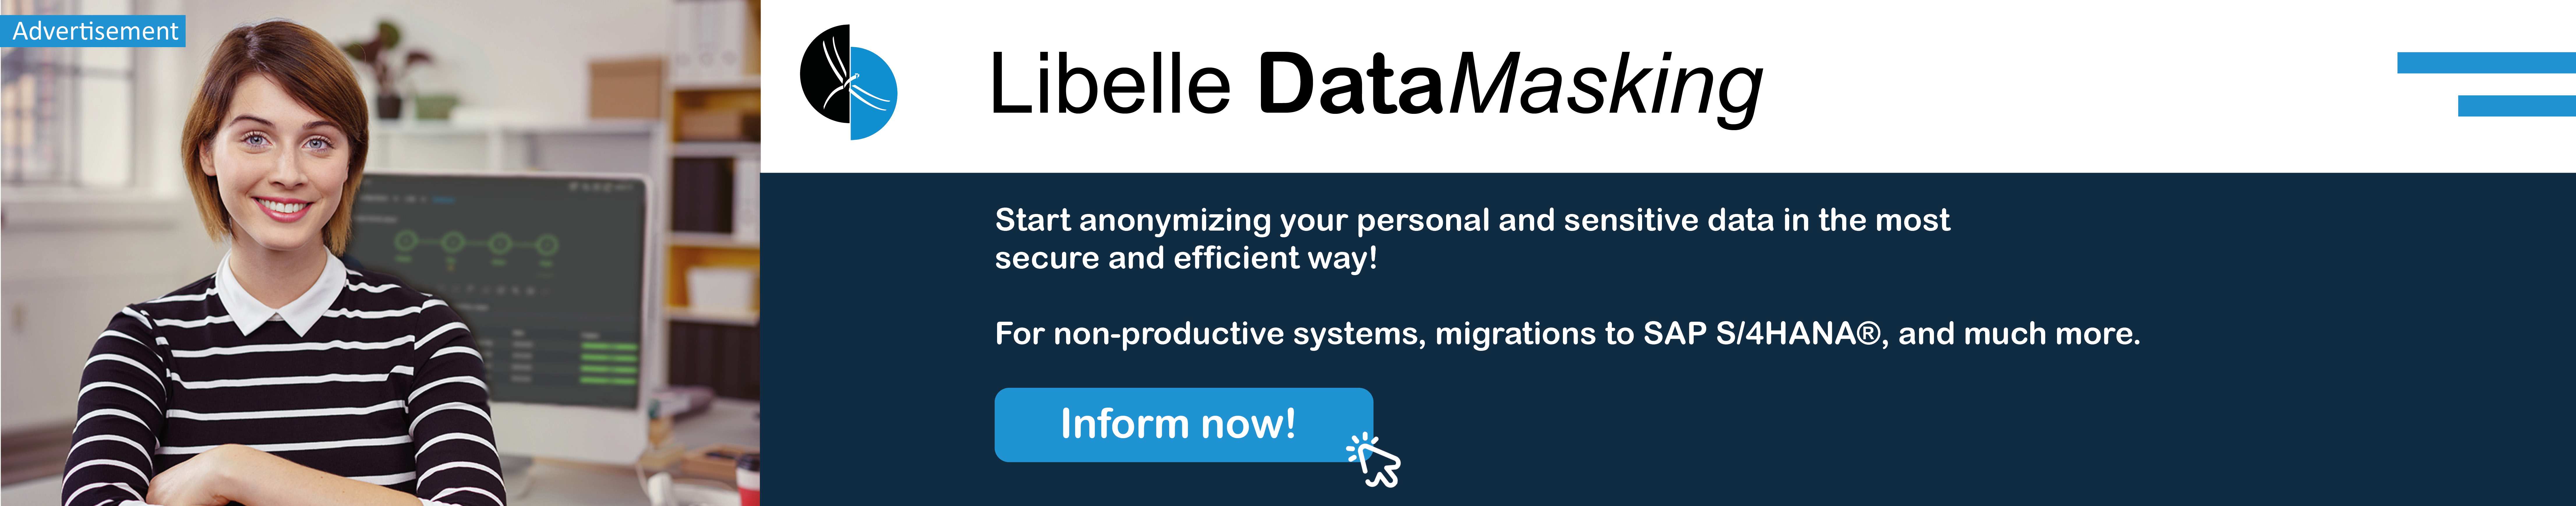 Libelle DataMasking advertisement